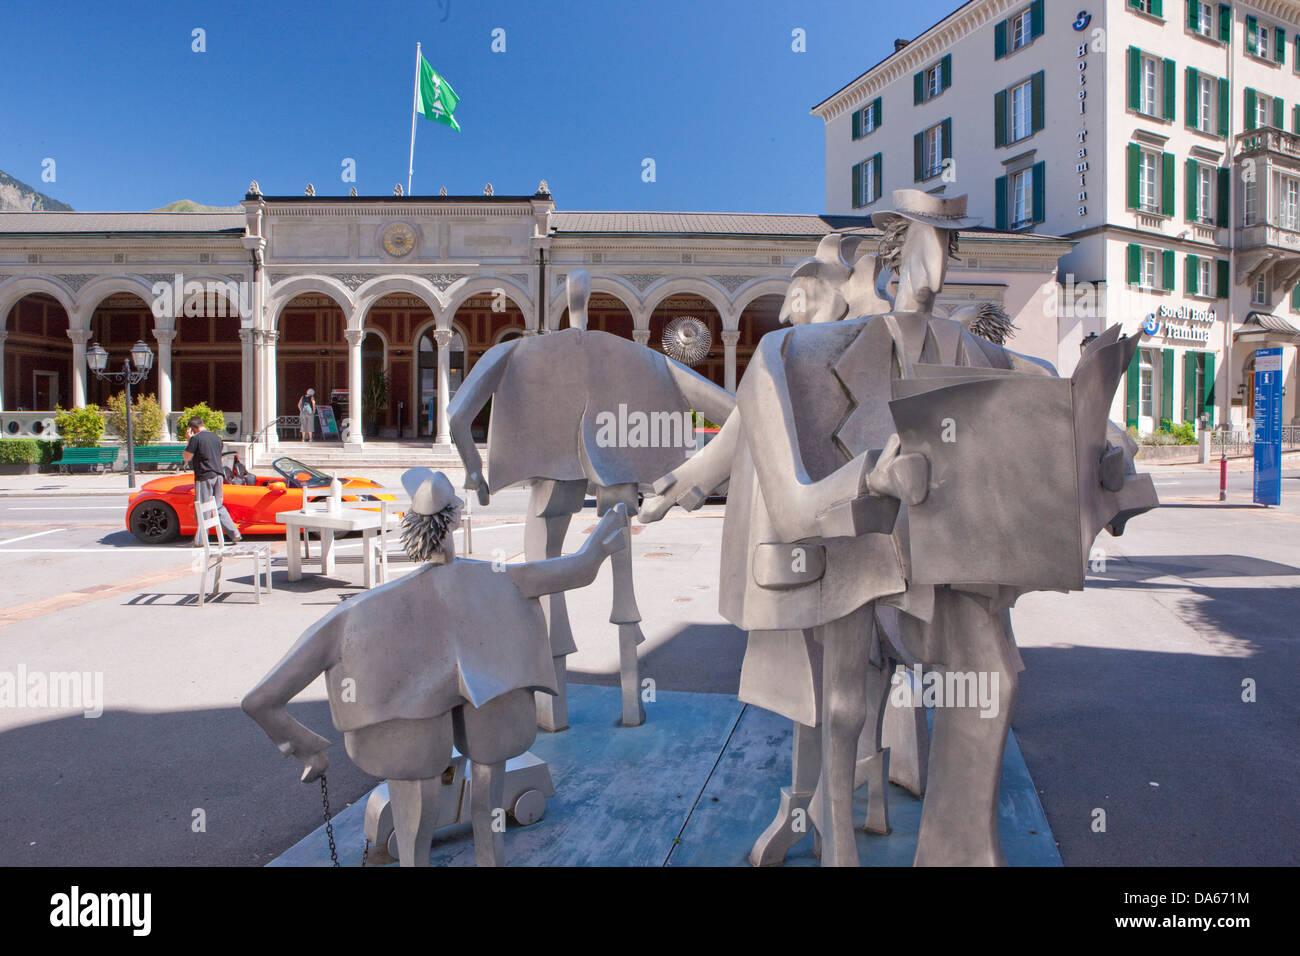 RagARTs, culture, canton, SG, St. Gallen, Switzerland, Europe, art, skill, Bad Ragaz, figures - Stock Image